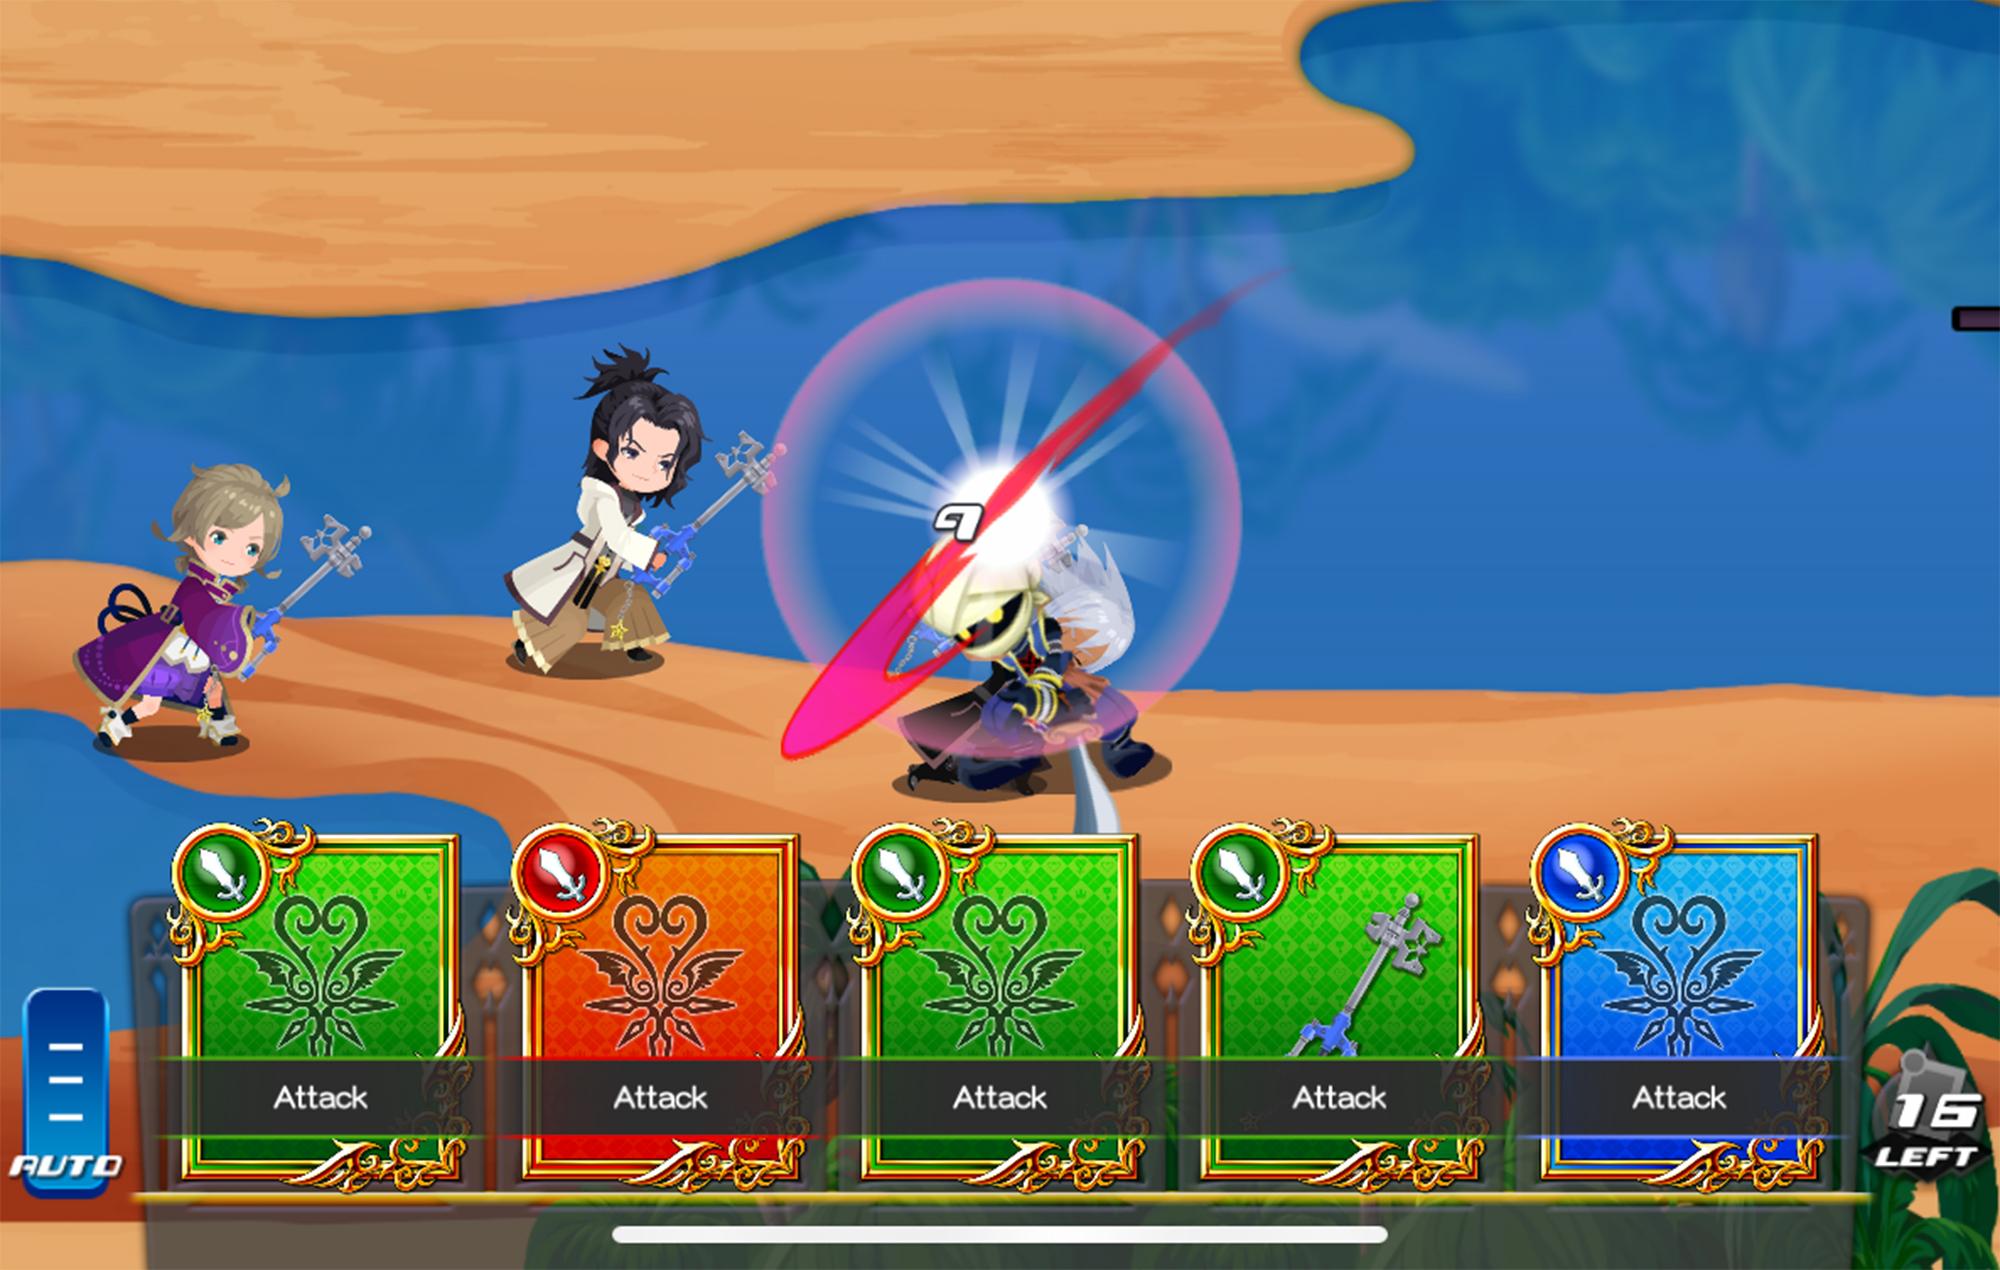 Kingdom Hearts Uχ Dark Road Mod Apk